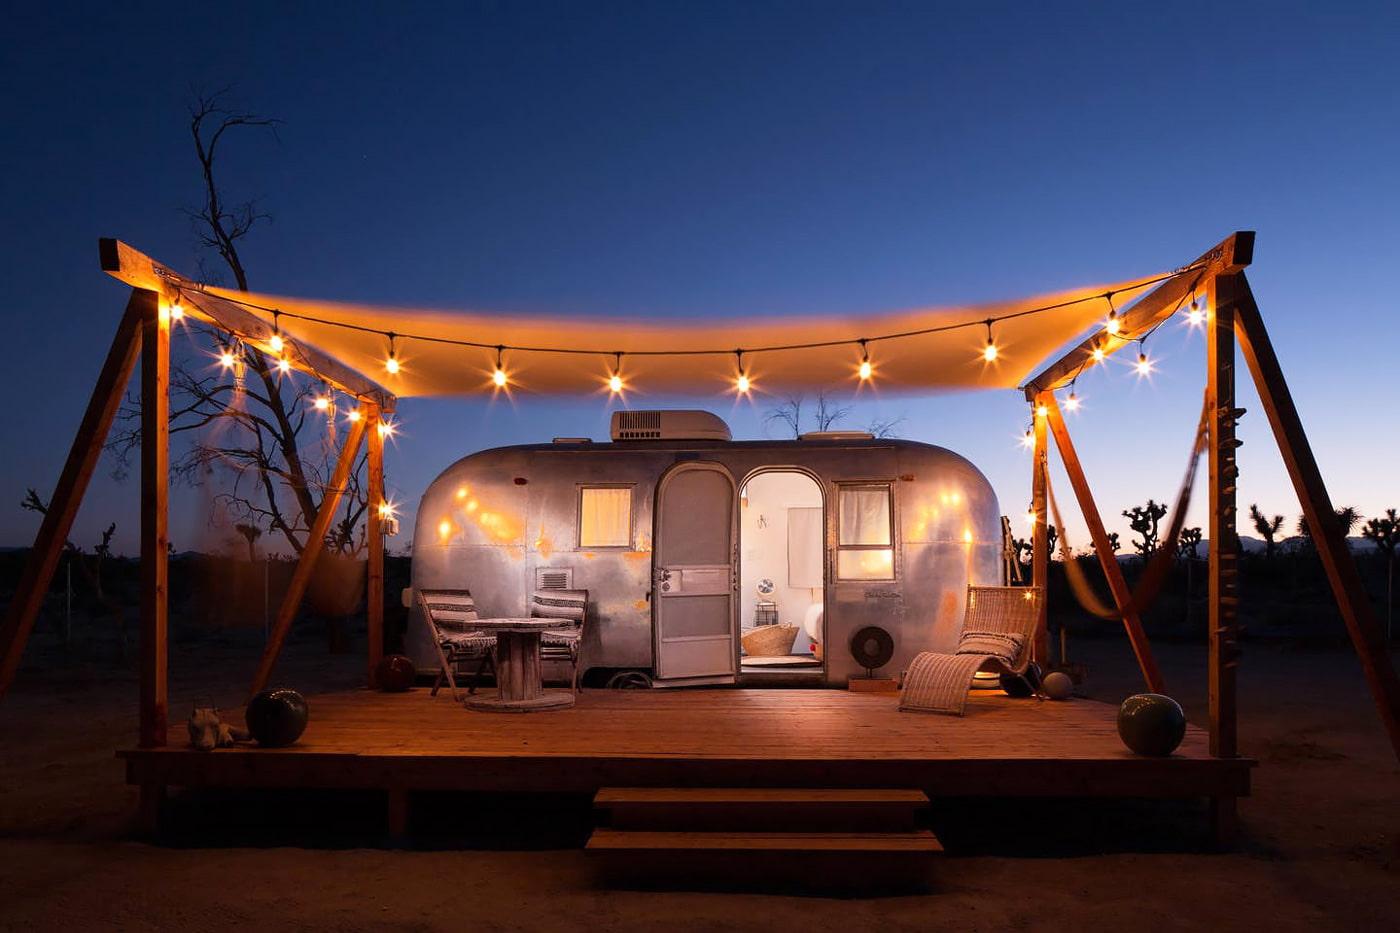 Airstream to rent in the California desert